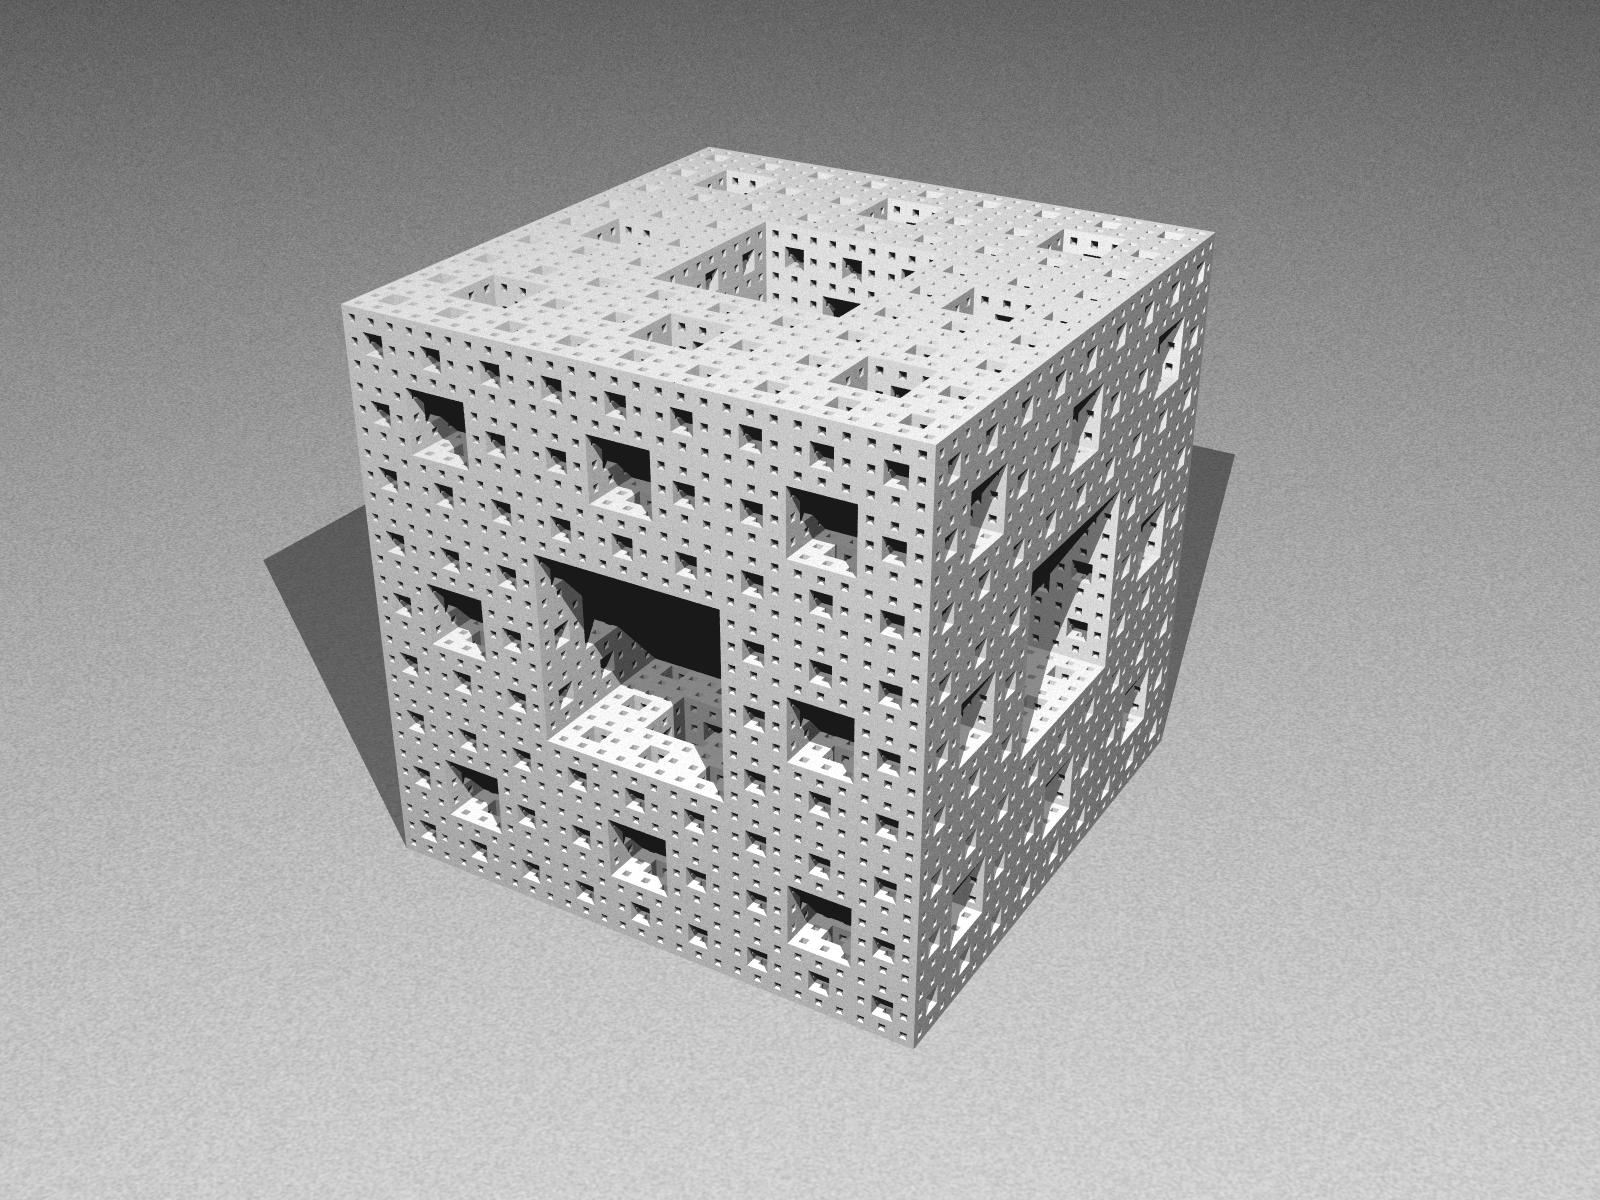 https://upload.wikimedia.org/wikipedia/commons/3/3b/Menger.png